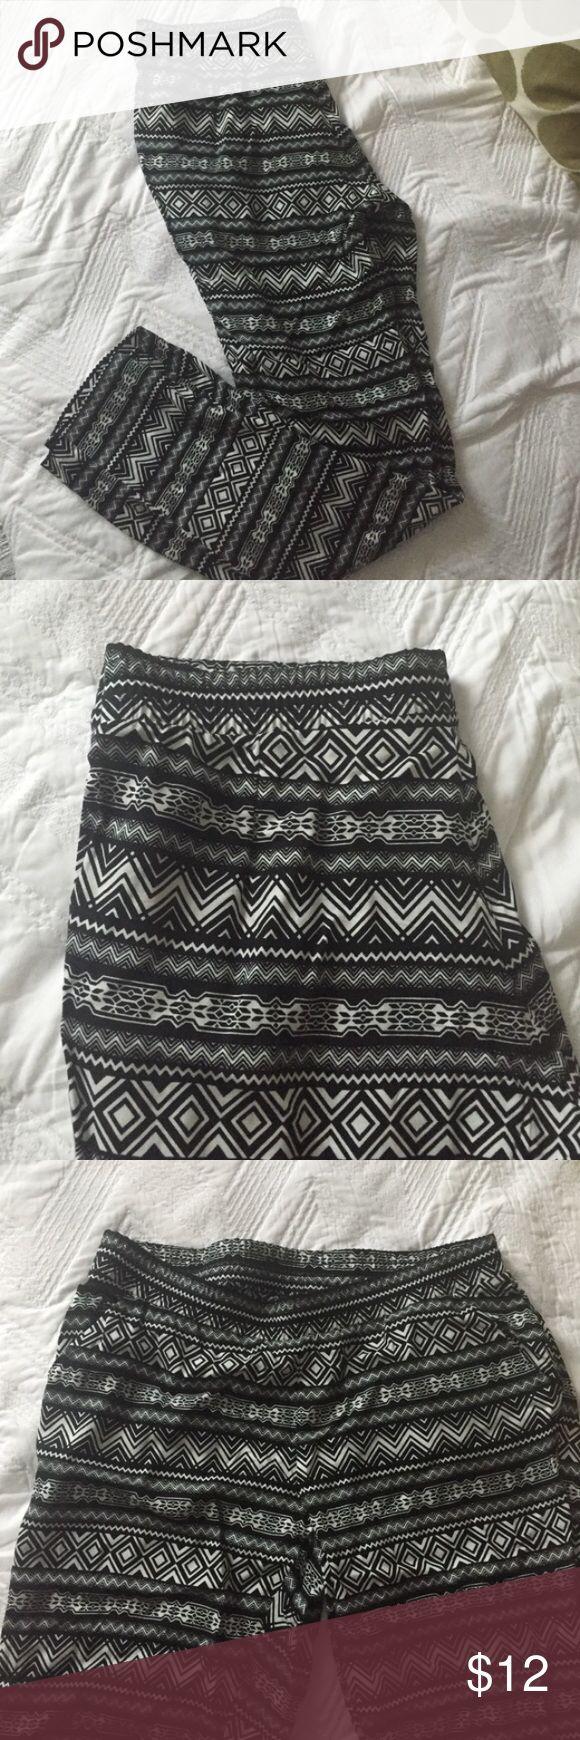 NWT Aztec pants H&M size 12 black white harem pant NWT Aztec pants H&M size 12 black and white slim leg harem pant H&M Pants Trousers